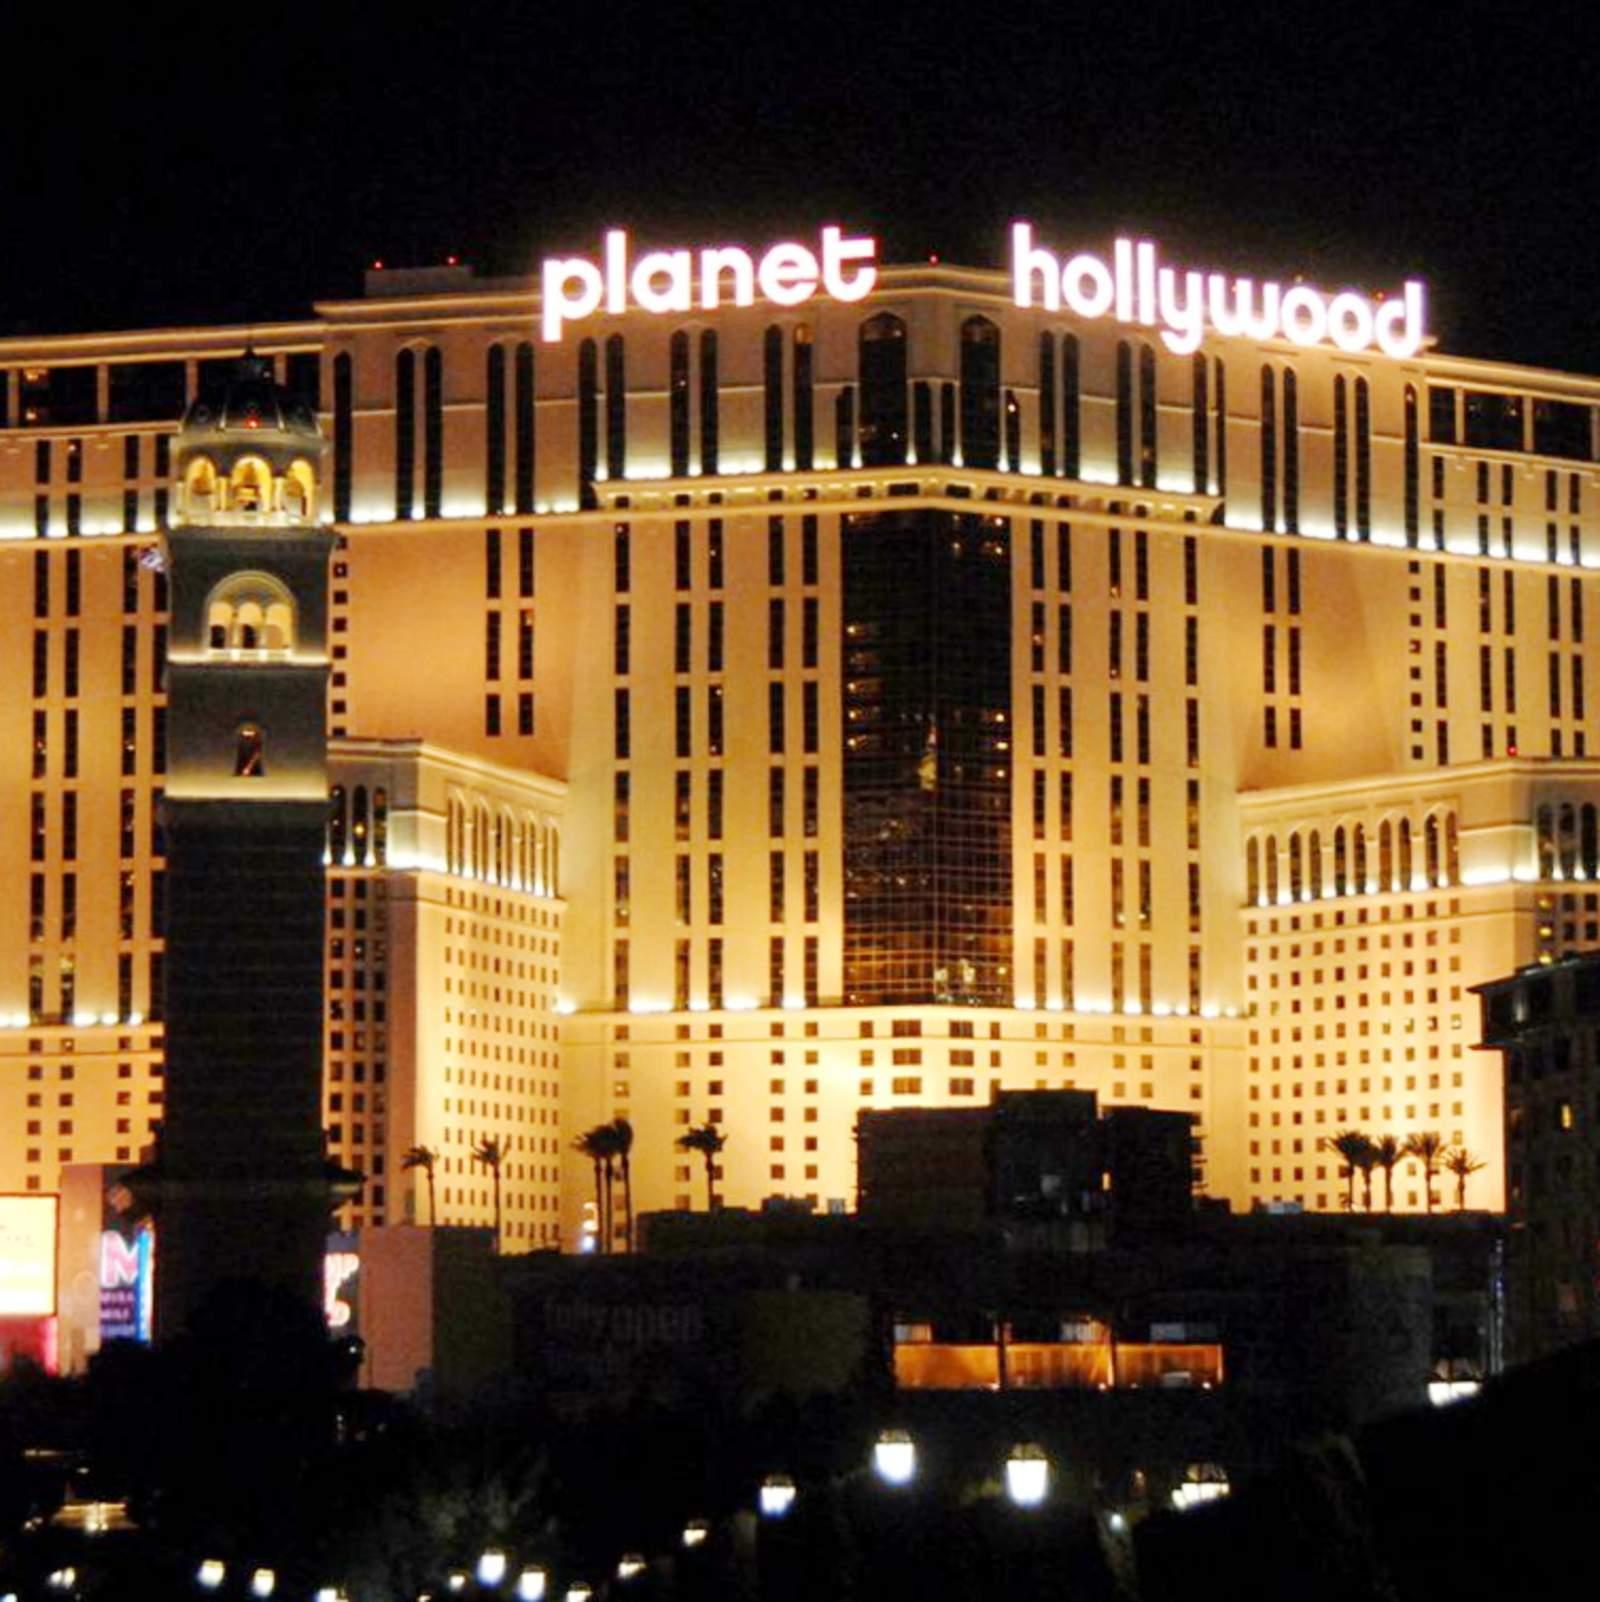 Flamingo hotel las vegas bei nacht aus dem heliopter - Las Vegas